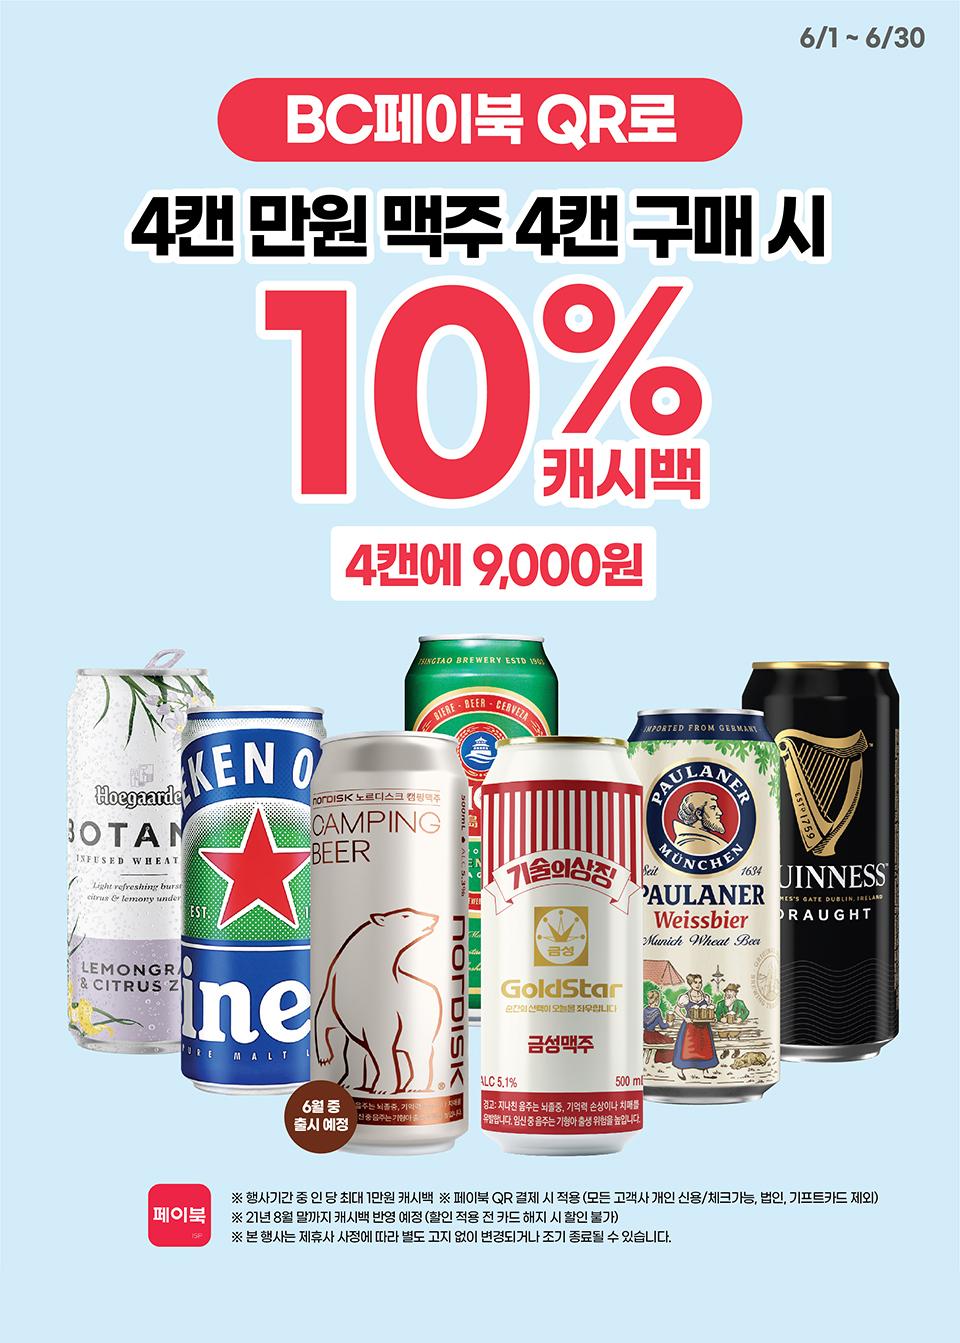 BC페이북 QR로 4캔 만원 맥주 4캔 구매 시 10% 캐시백